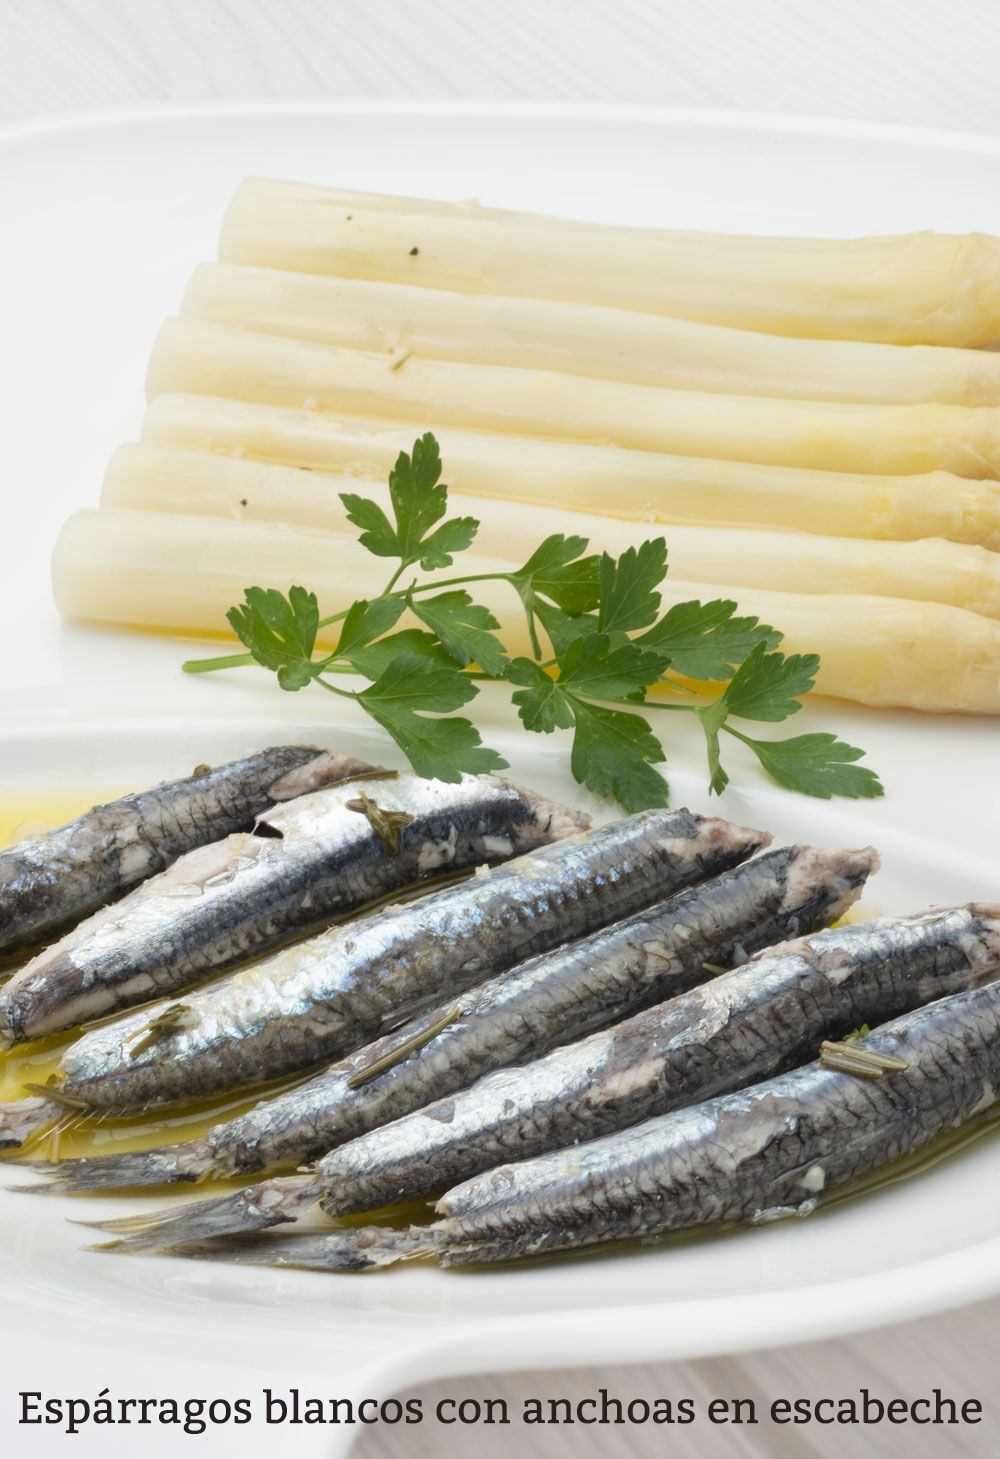 Espárragos blancos con anchoas en escabeche